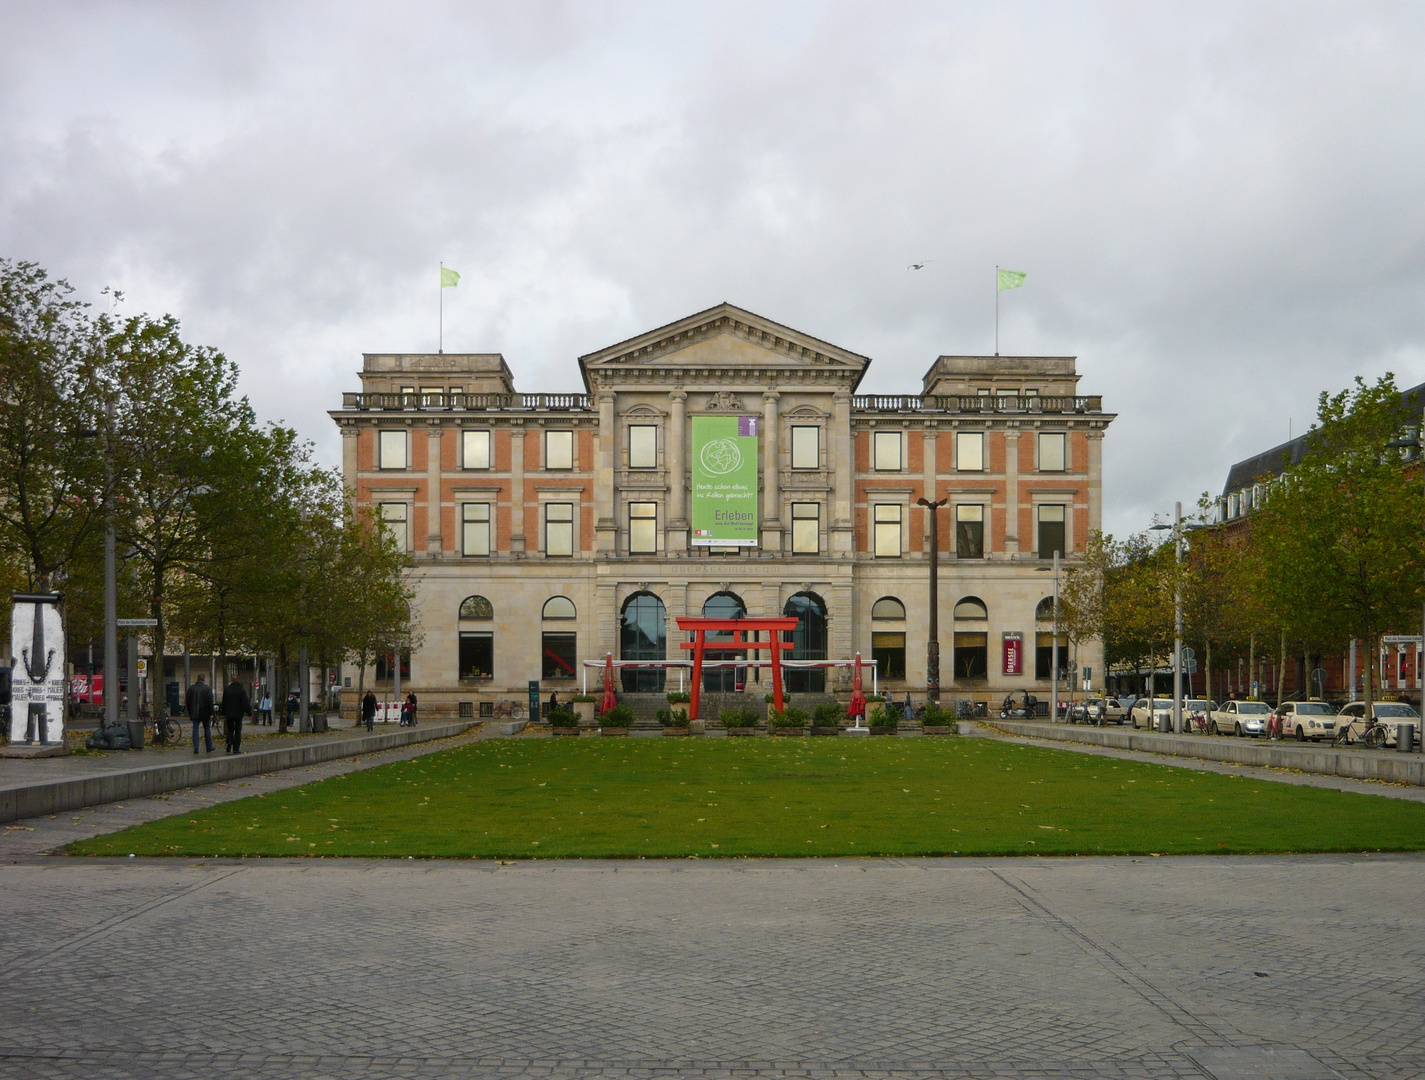 Überseemuseum